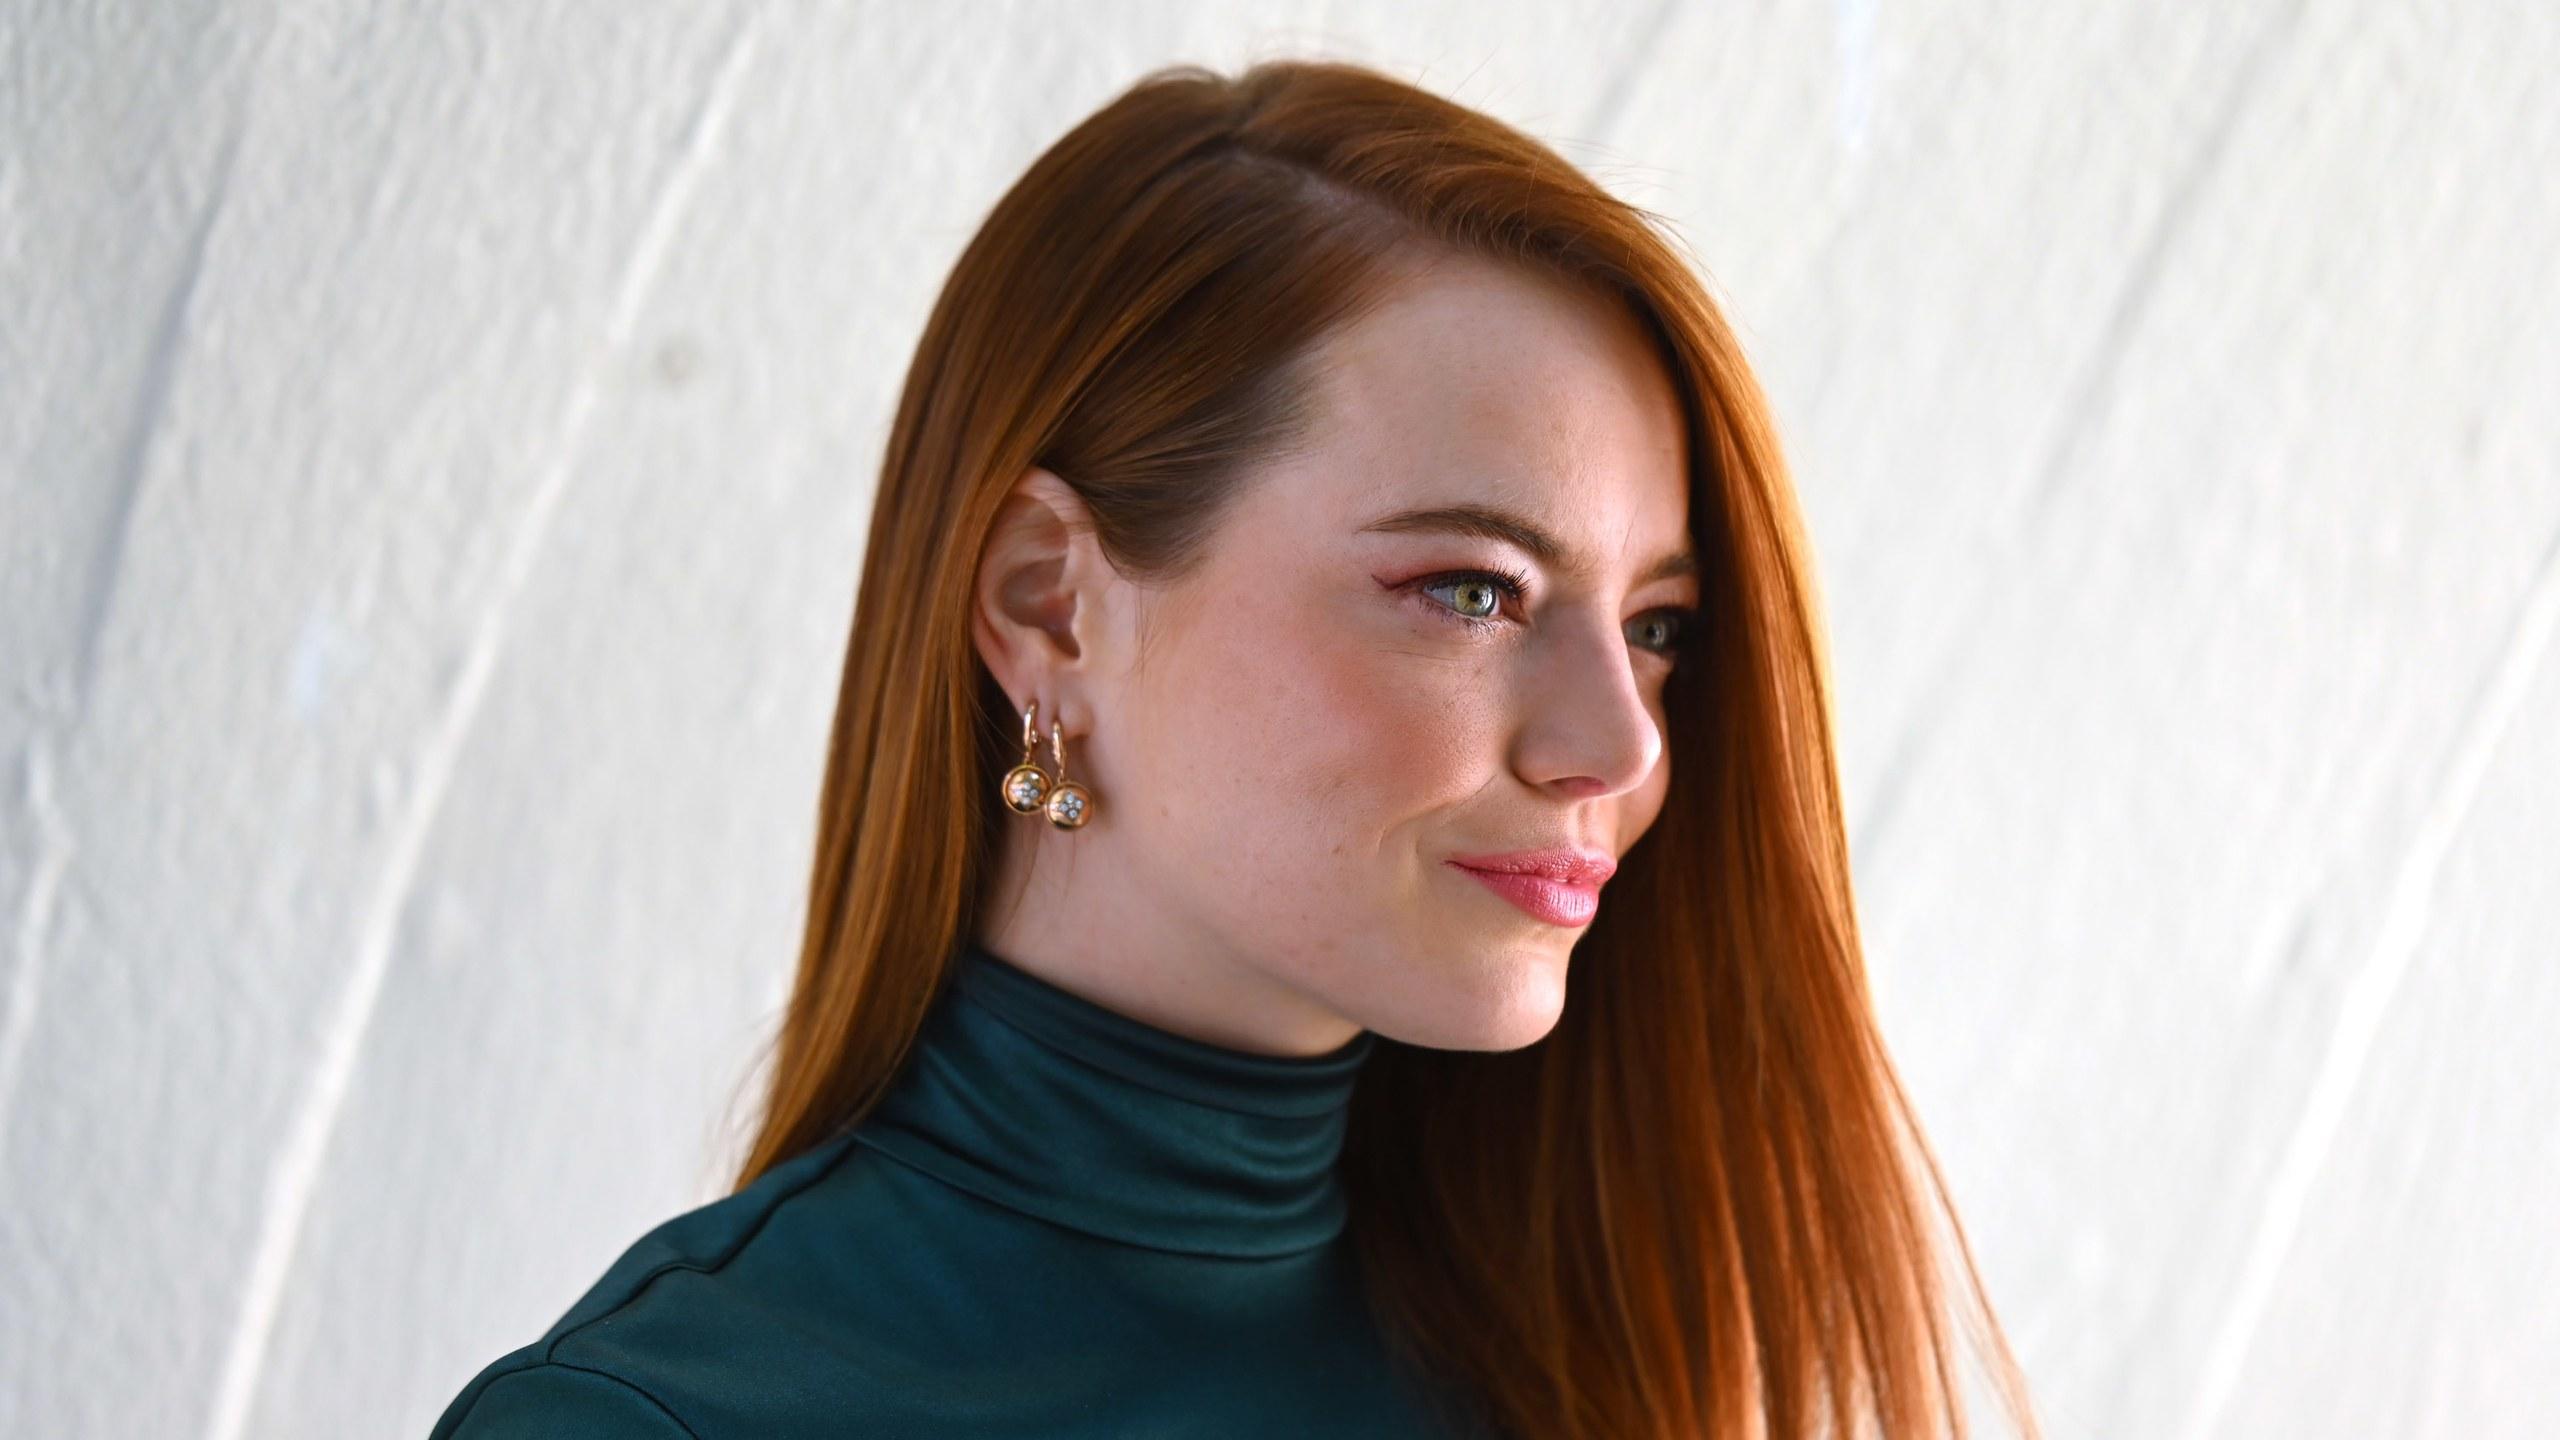 Emma Stone Had a Major Hair Transformation to Play Cruella de Vil 2560x1440